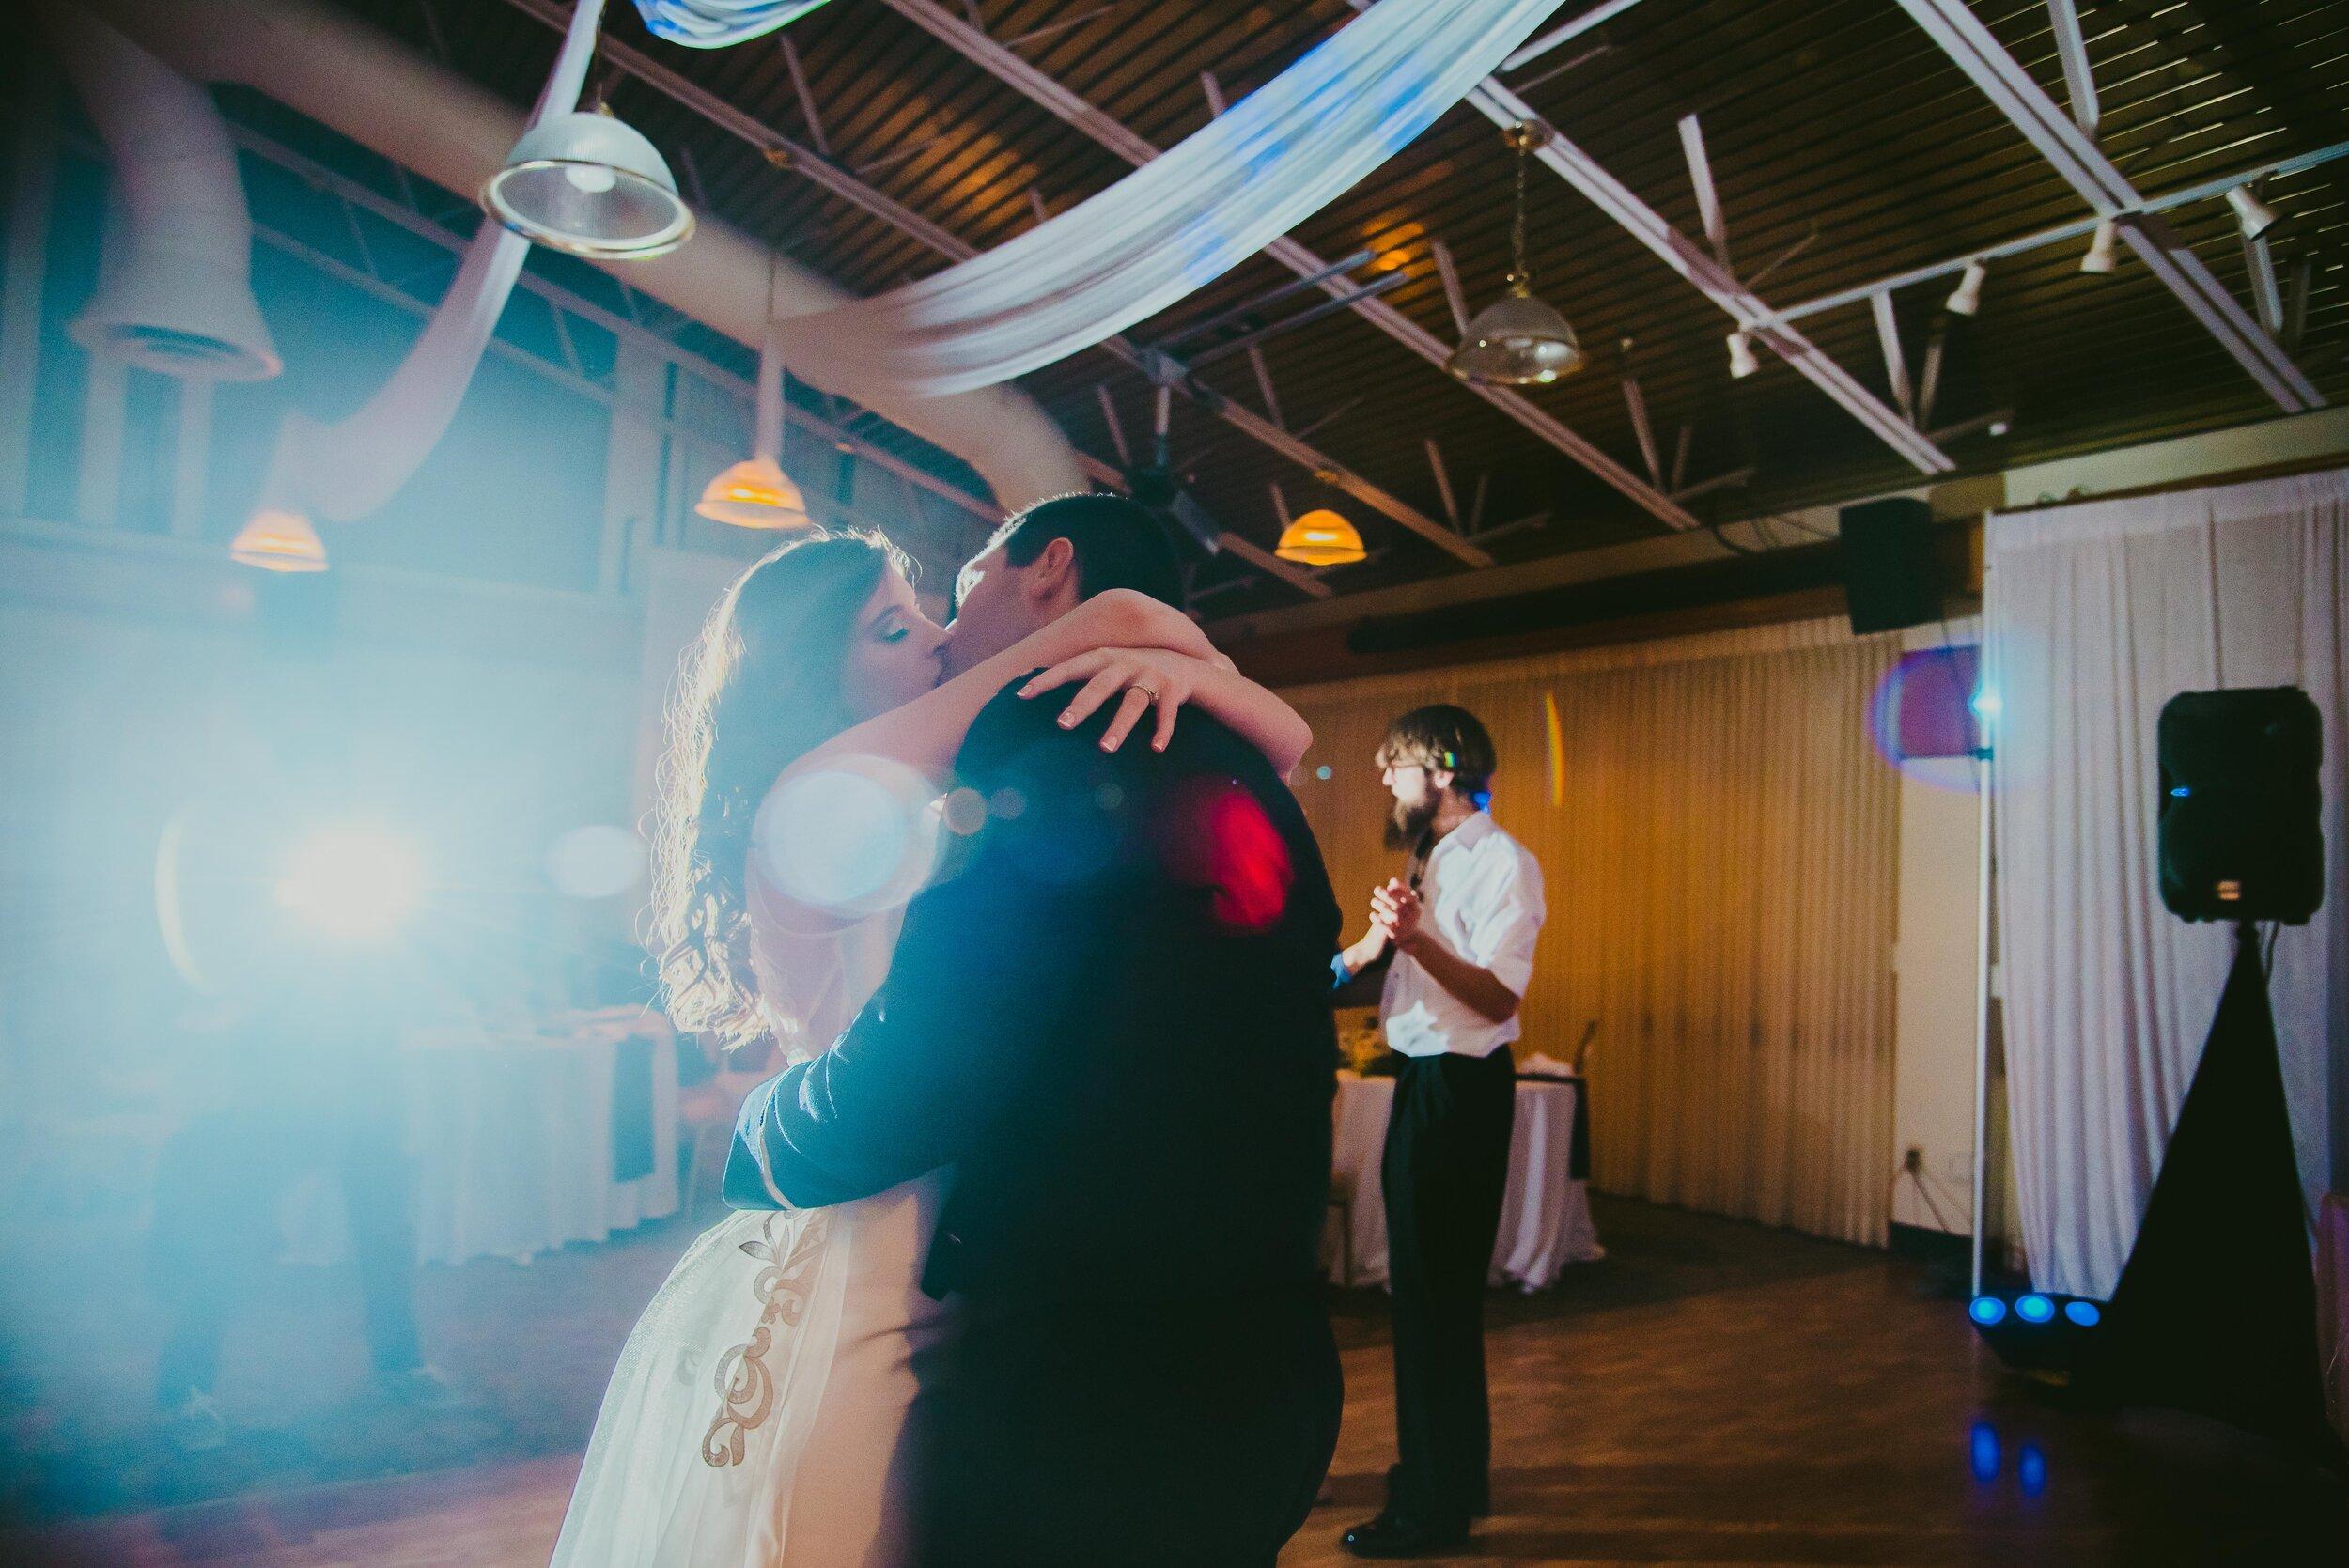 andru-the-tide-club-air-force-wedding-patrickafb-1-3.jpg